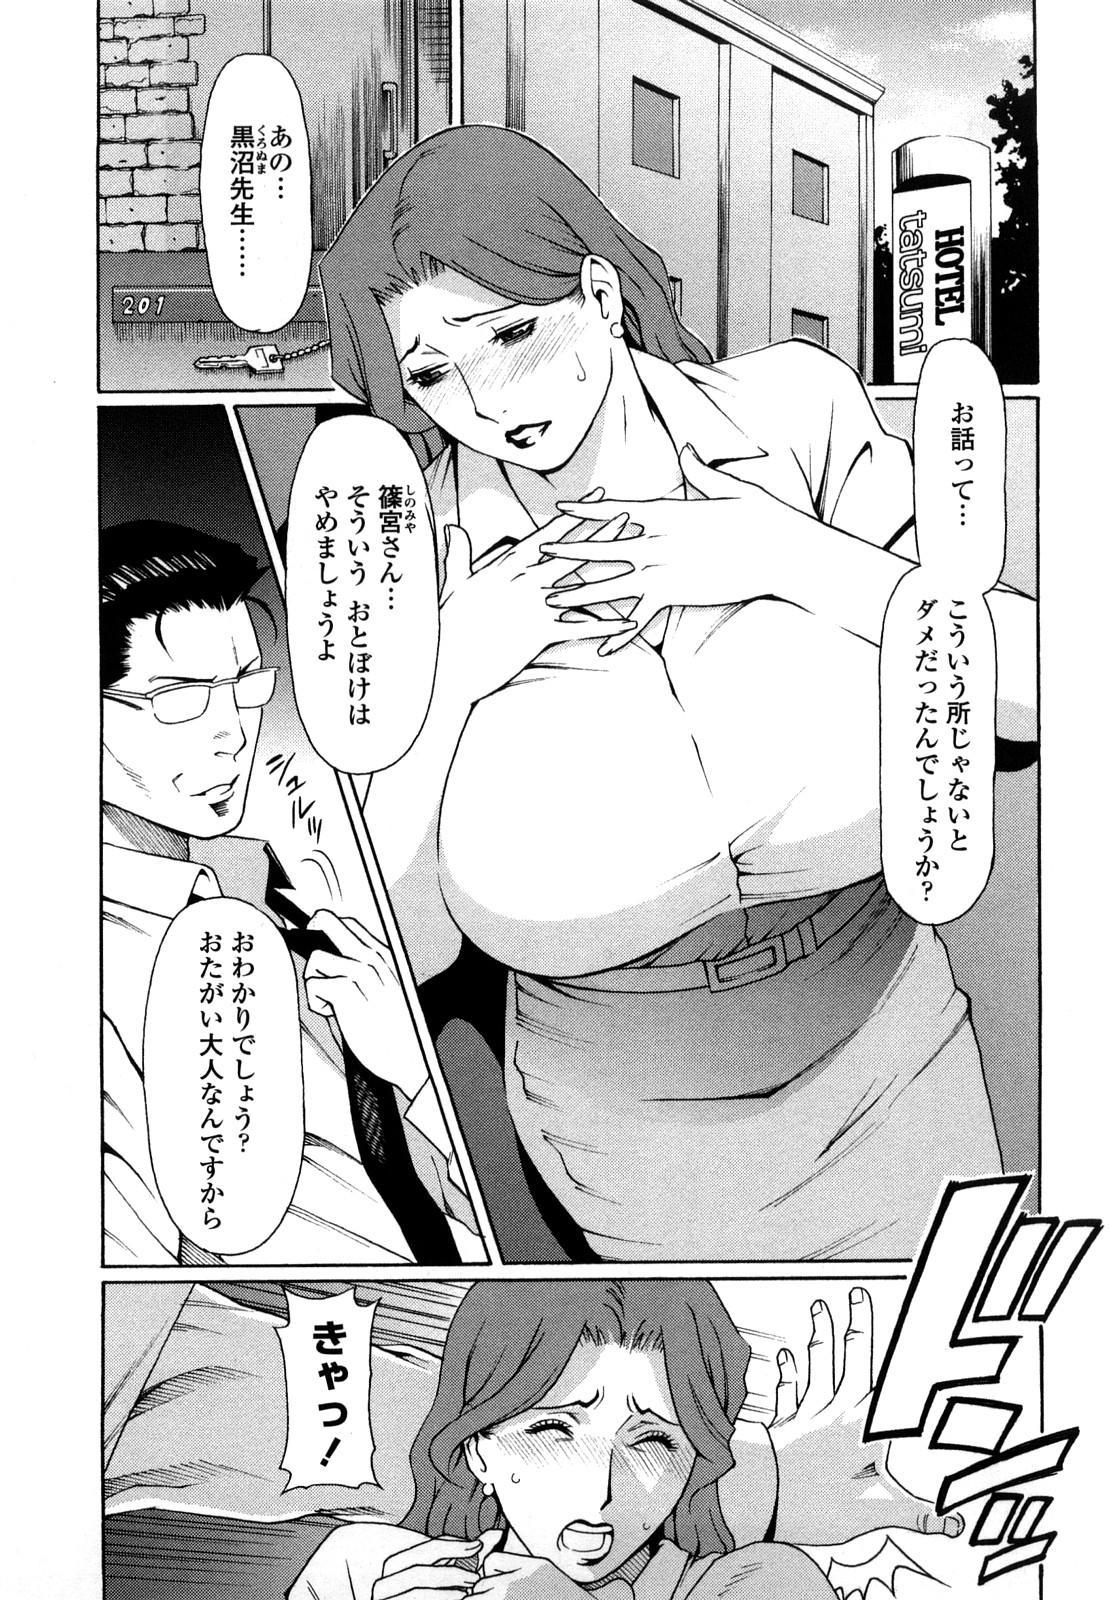 [Takasugi Kou] Kindan no Haha-Ana - Immorality Love-Hole [Decensored] 84